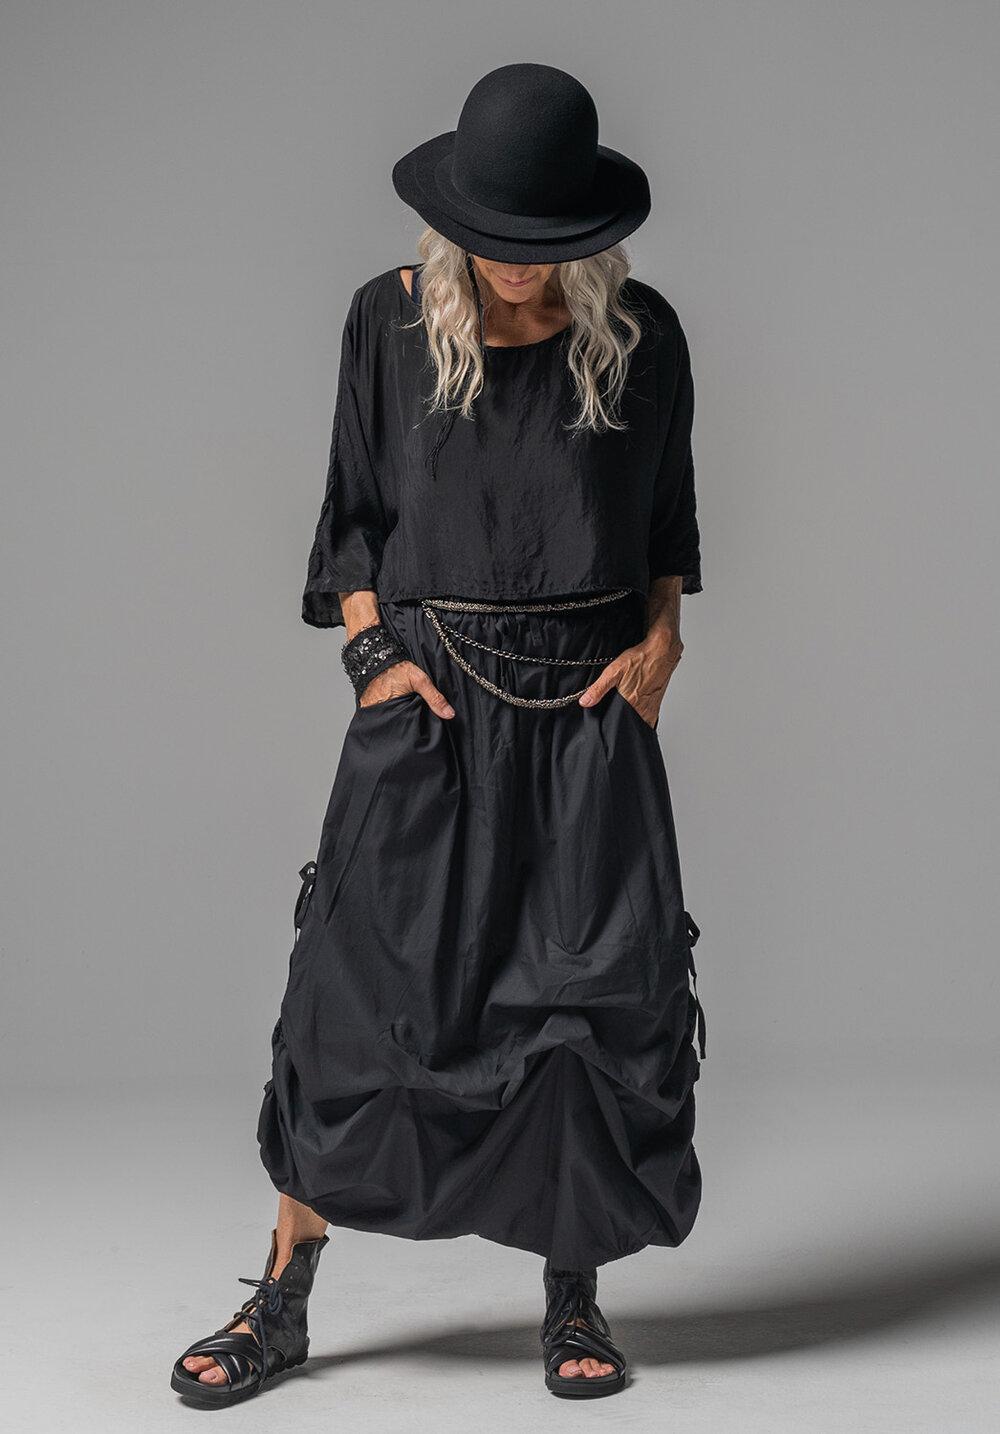 Archive top, Greta singlet + Marmalade skirt